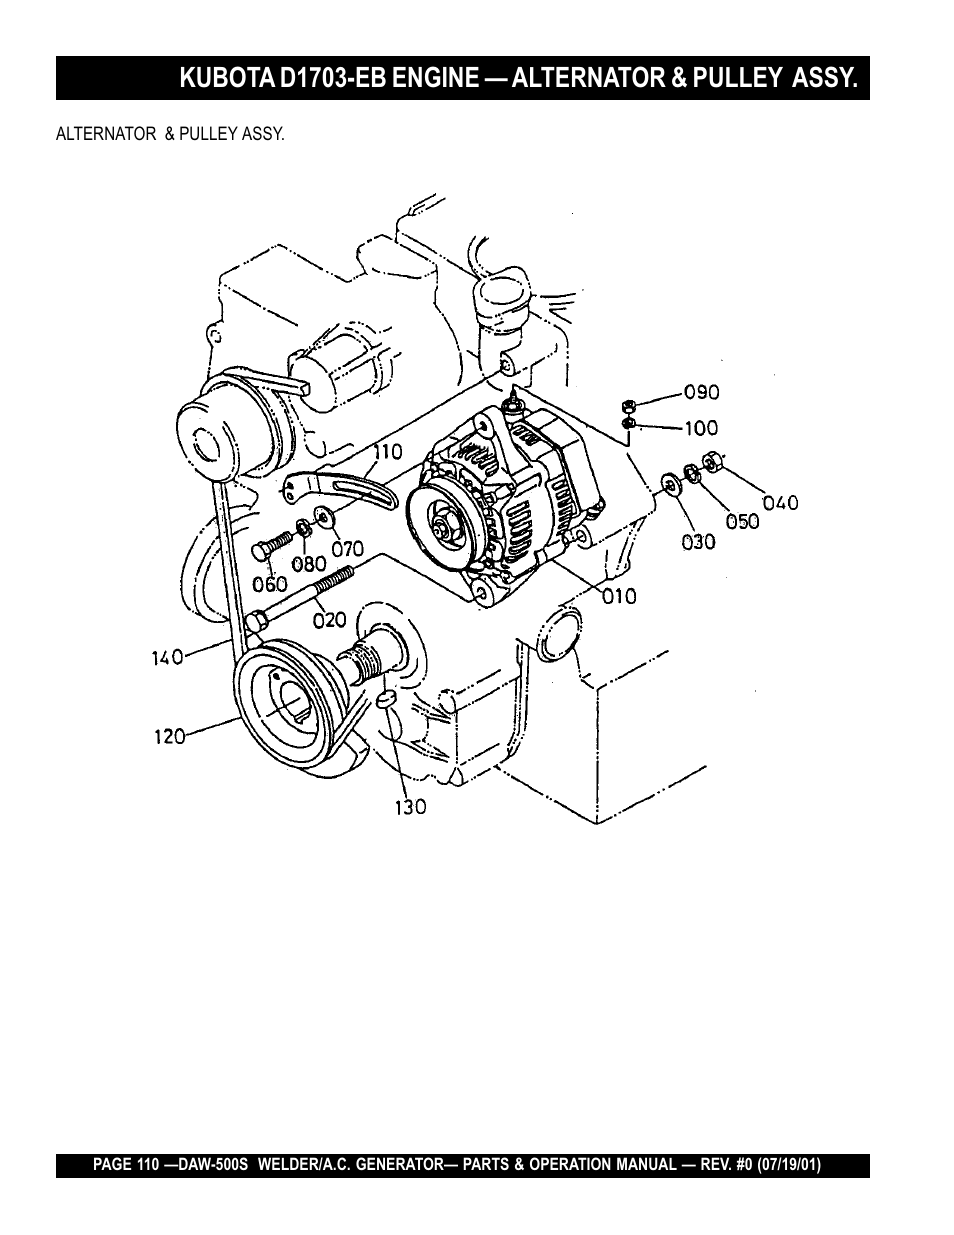 Kubota d1703-eb engine — alternator & pulley assy | Multiquip DAW500S User  Manual | Page 110 / 142